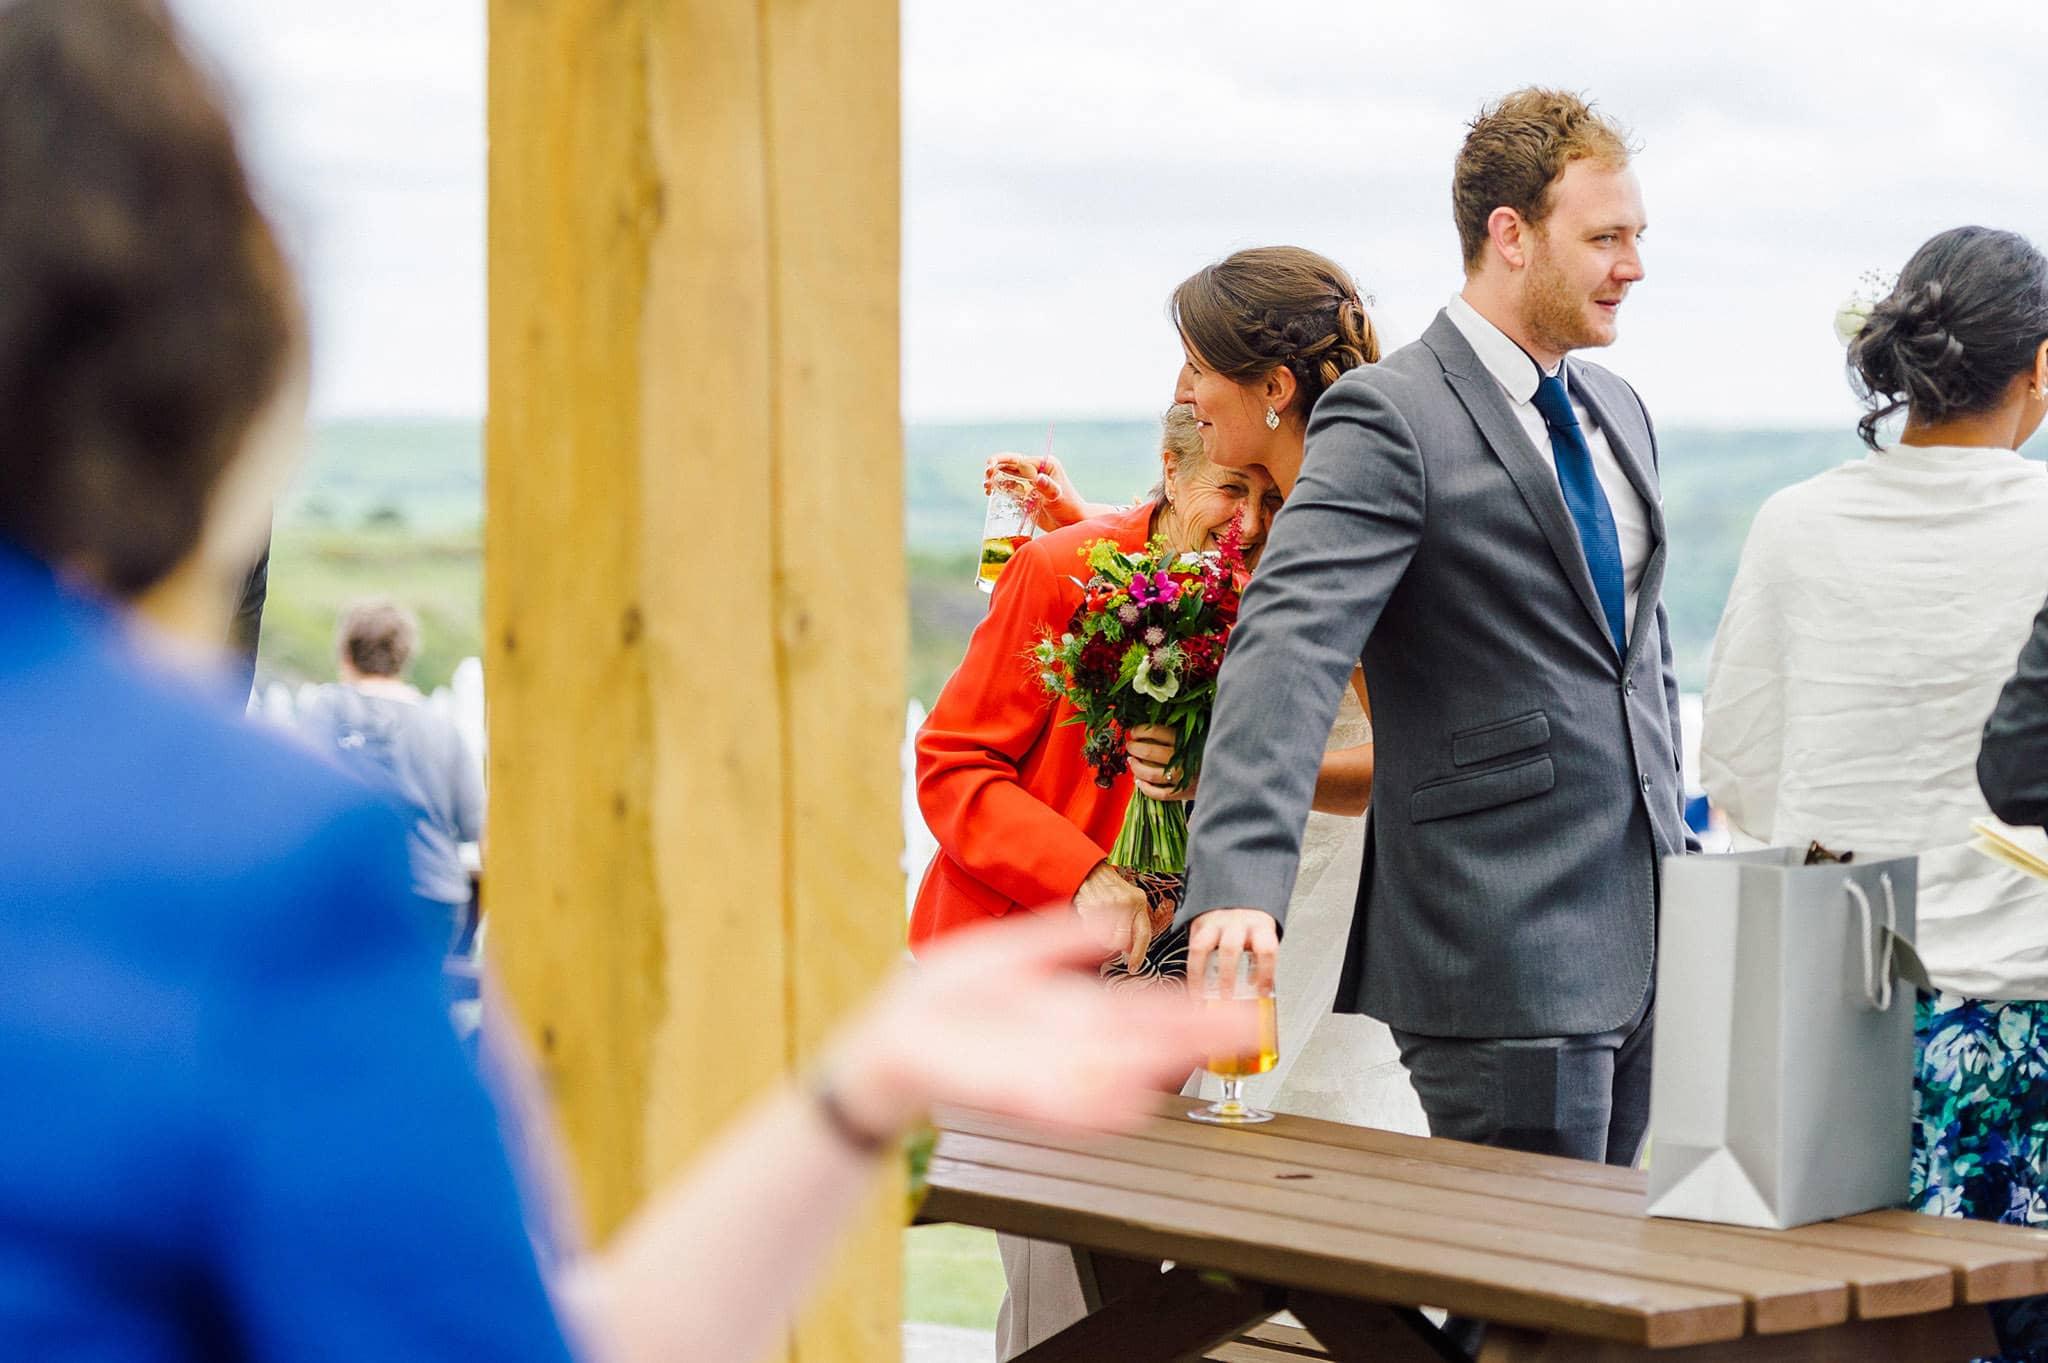 wedding-photographer-aberystwyth-wales (149)